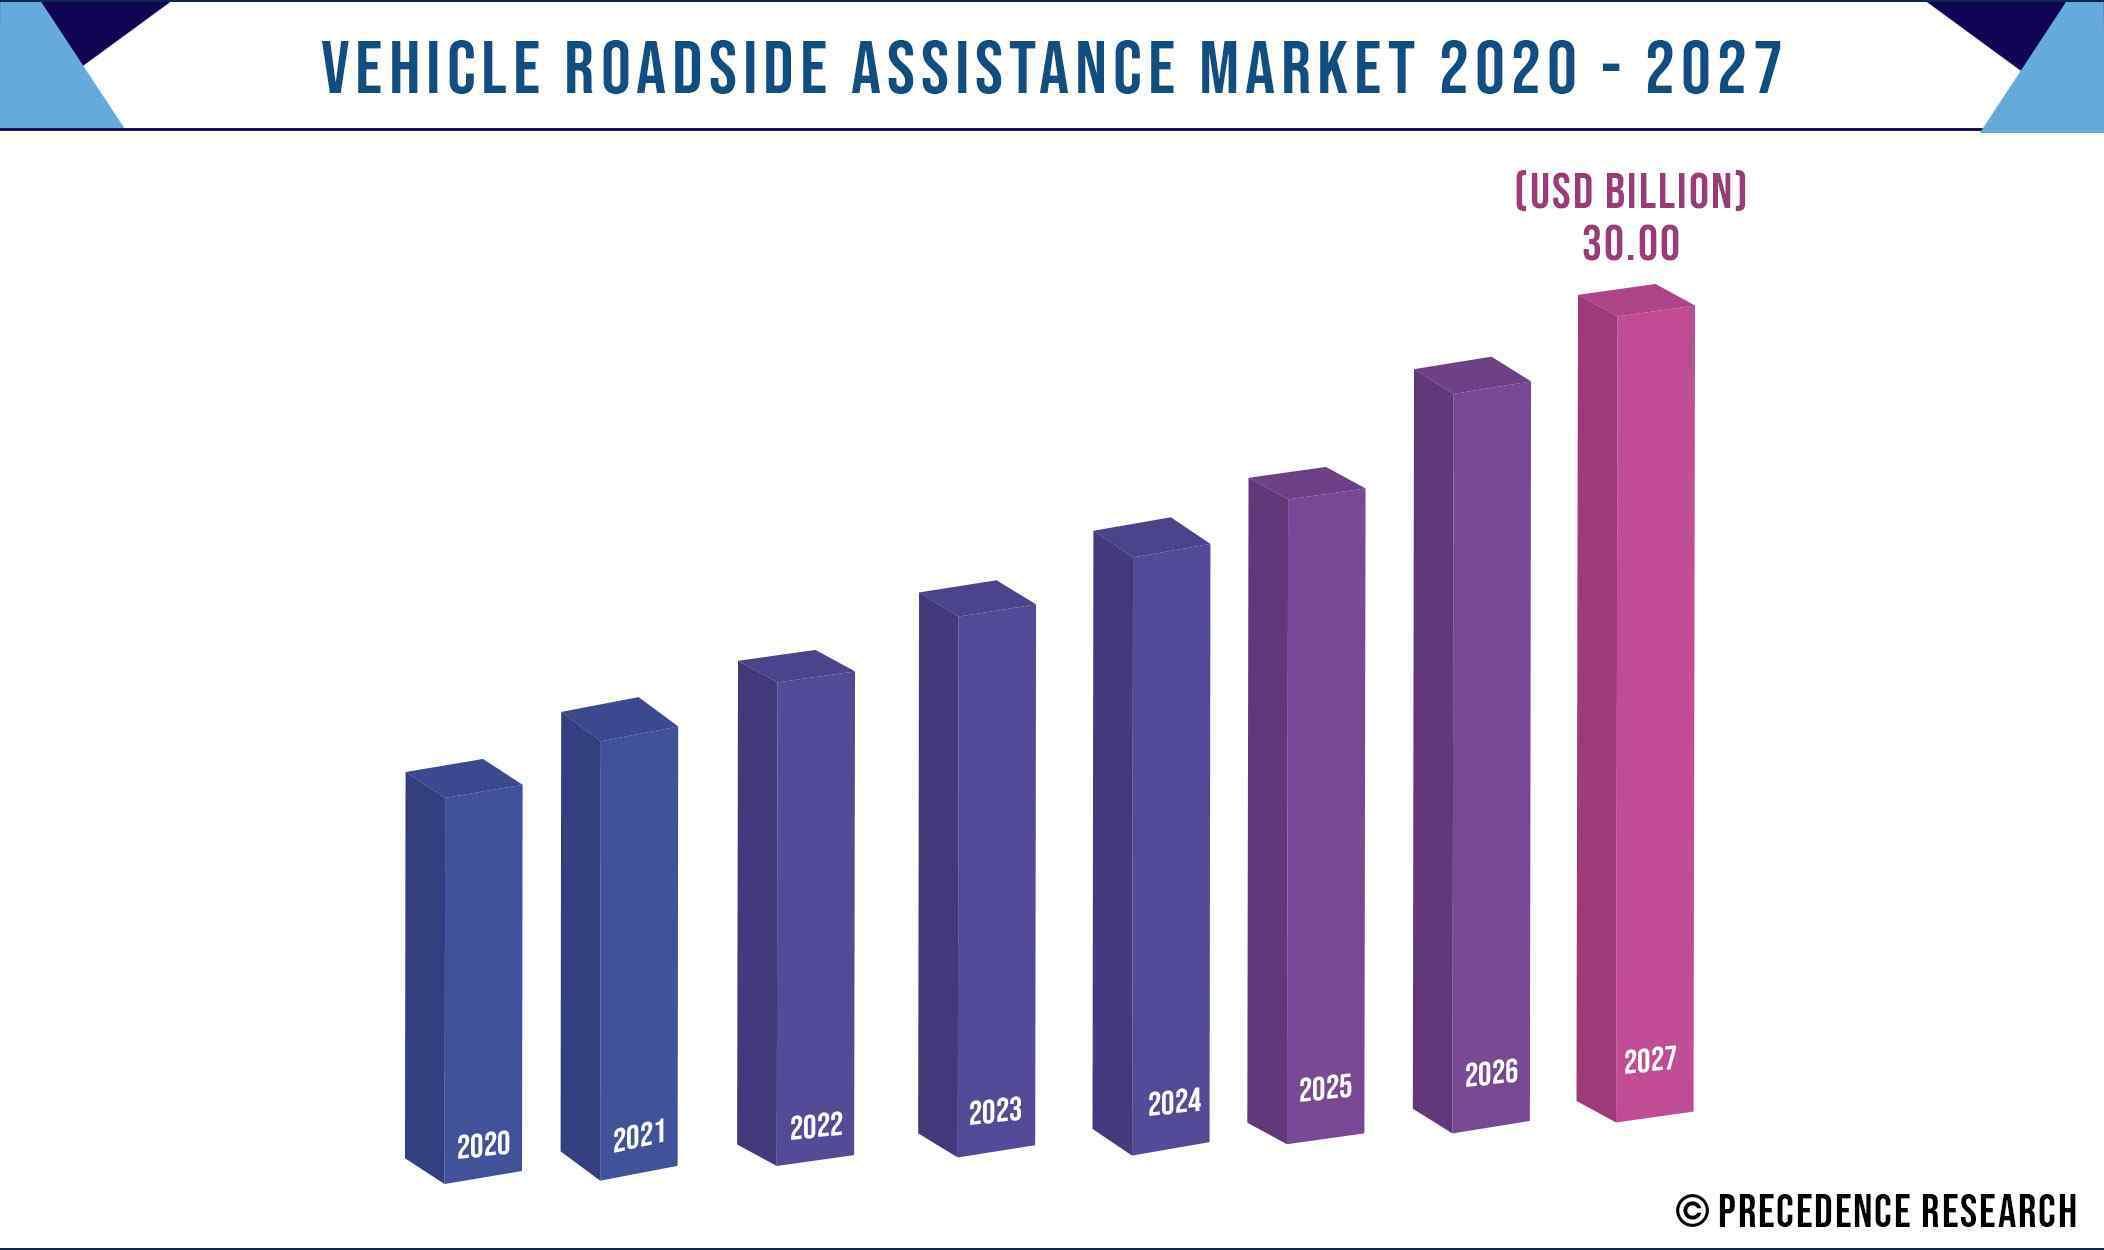 Vehicle Roadside Assistance Market Size 2020-2027